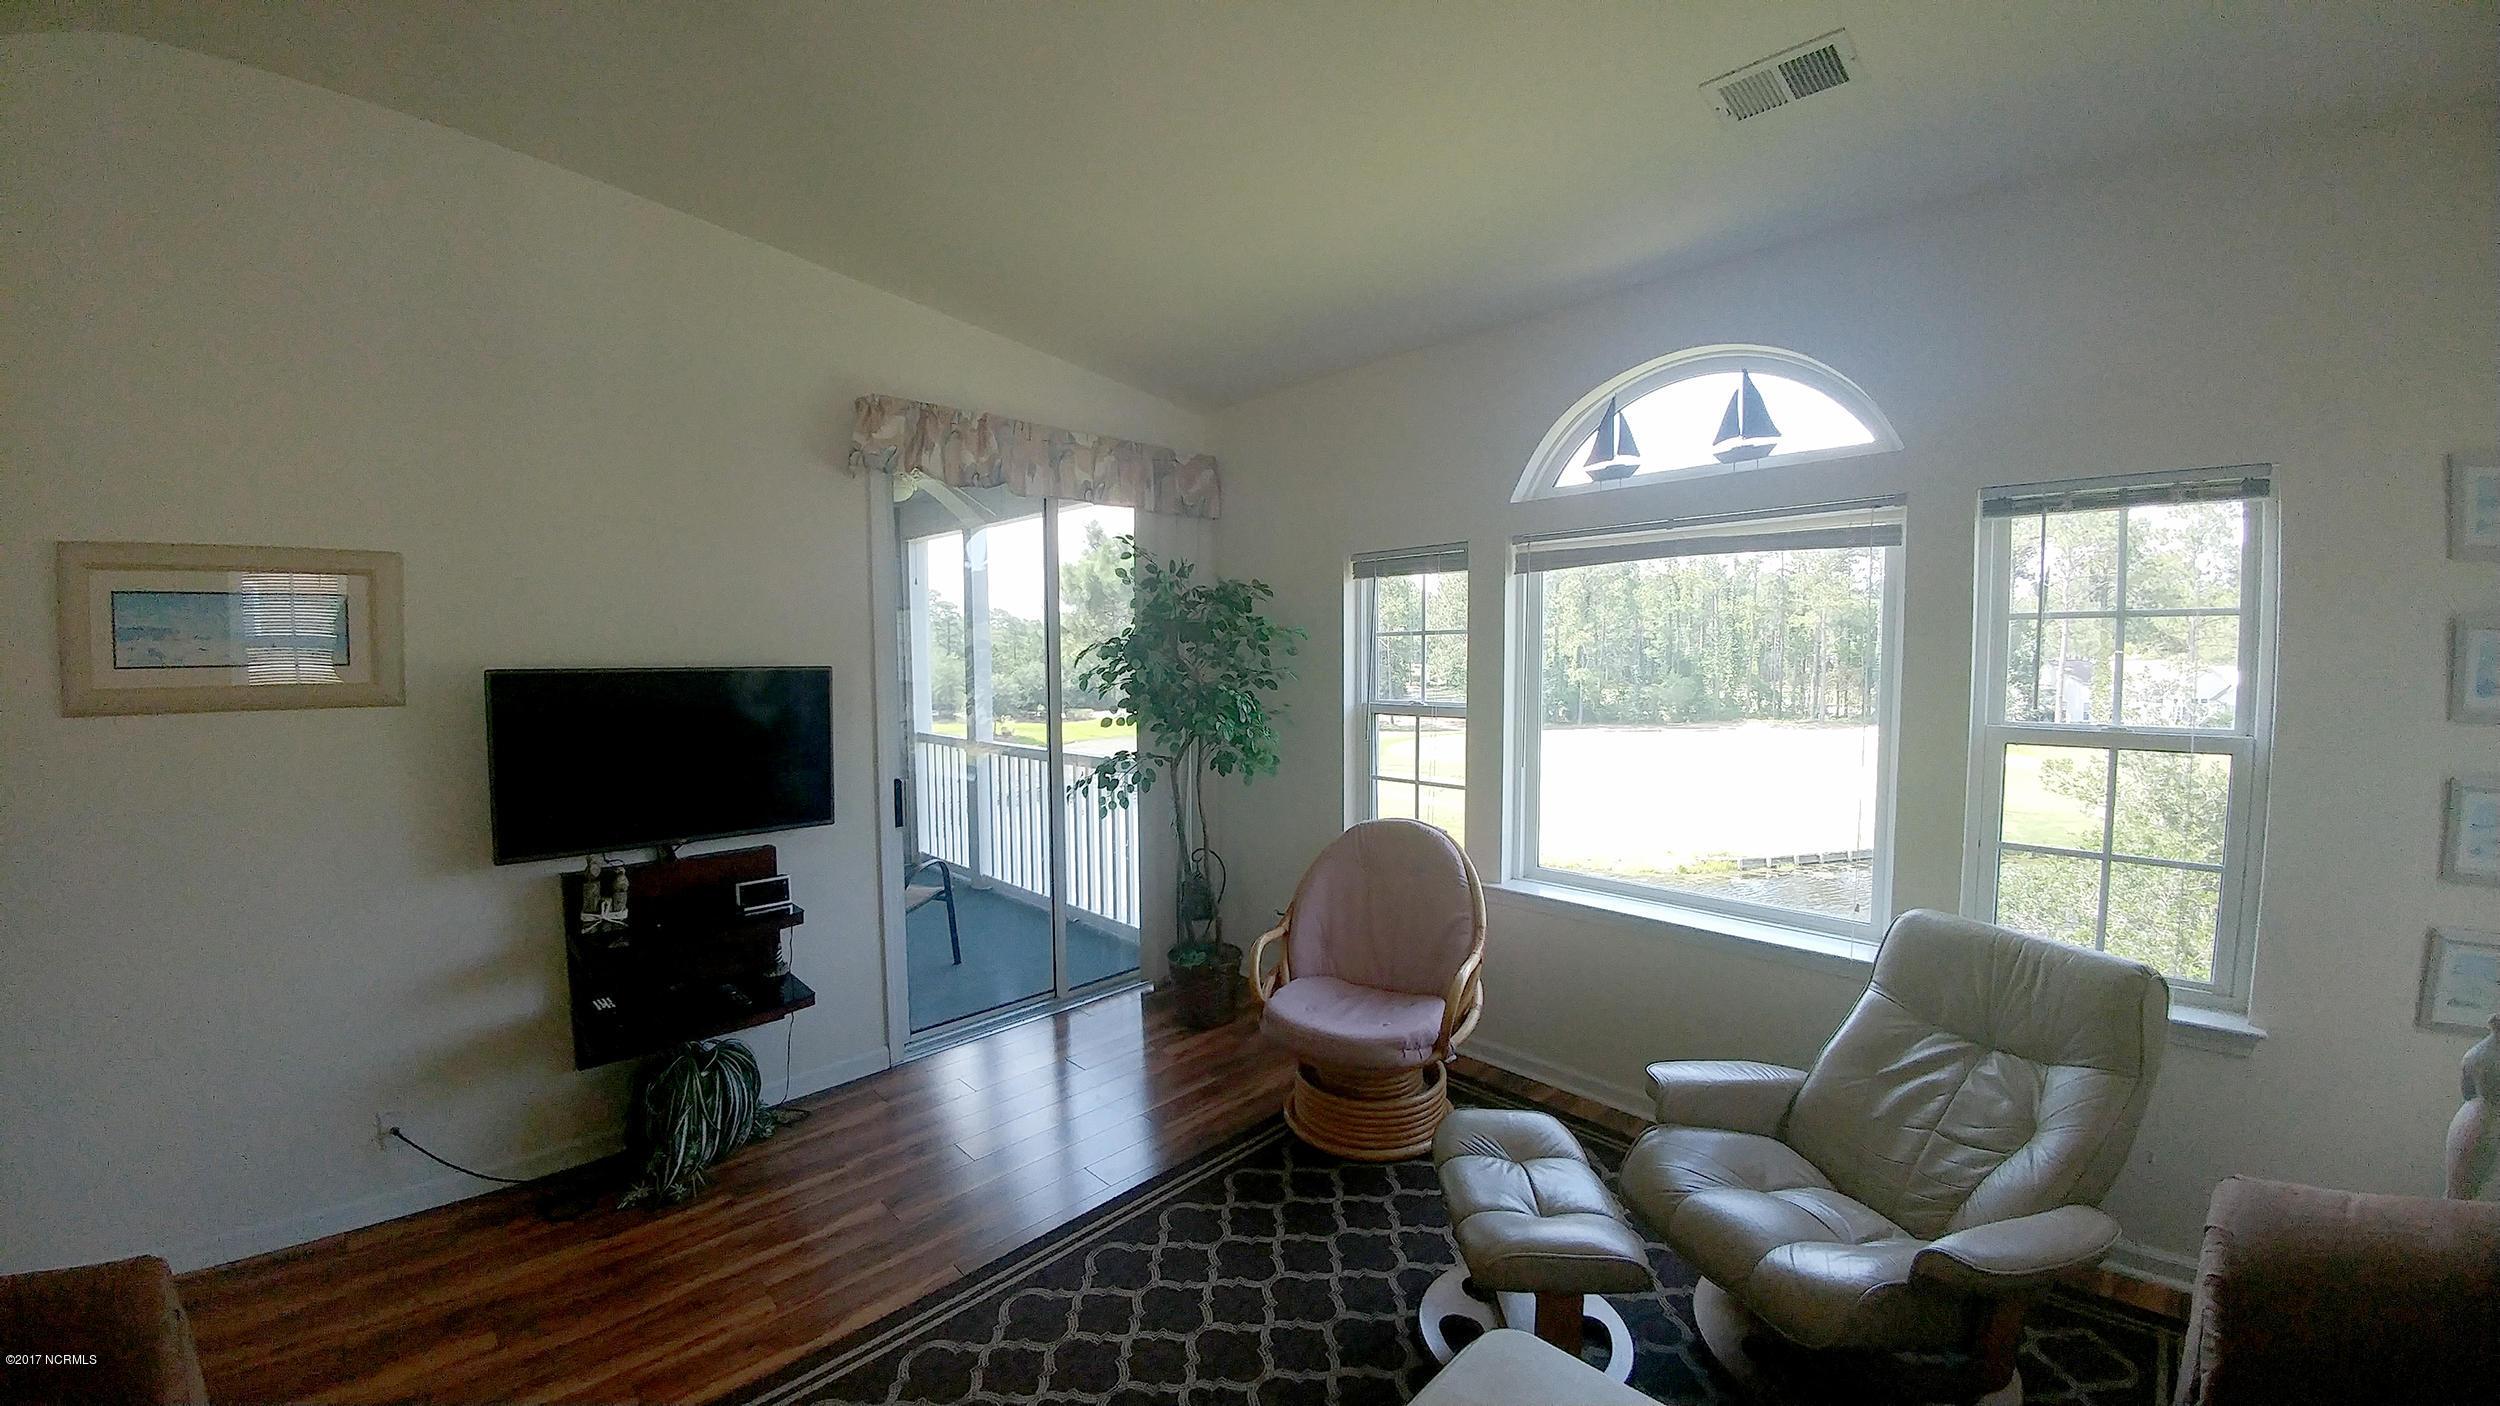 872 Great Egret Circle, Sunset Beach, North Carolina, 3 Bedrooms Bedrooms, 5 Rooms Rooms,2 BathroomsBathrooms,Condominium,For sale,Great Egret,100069337